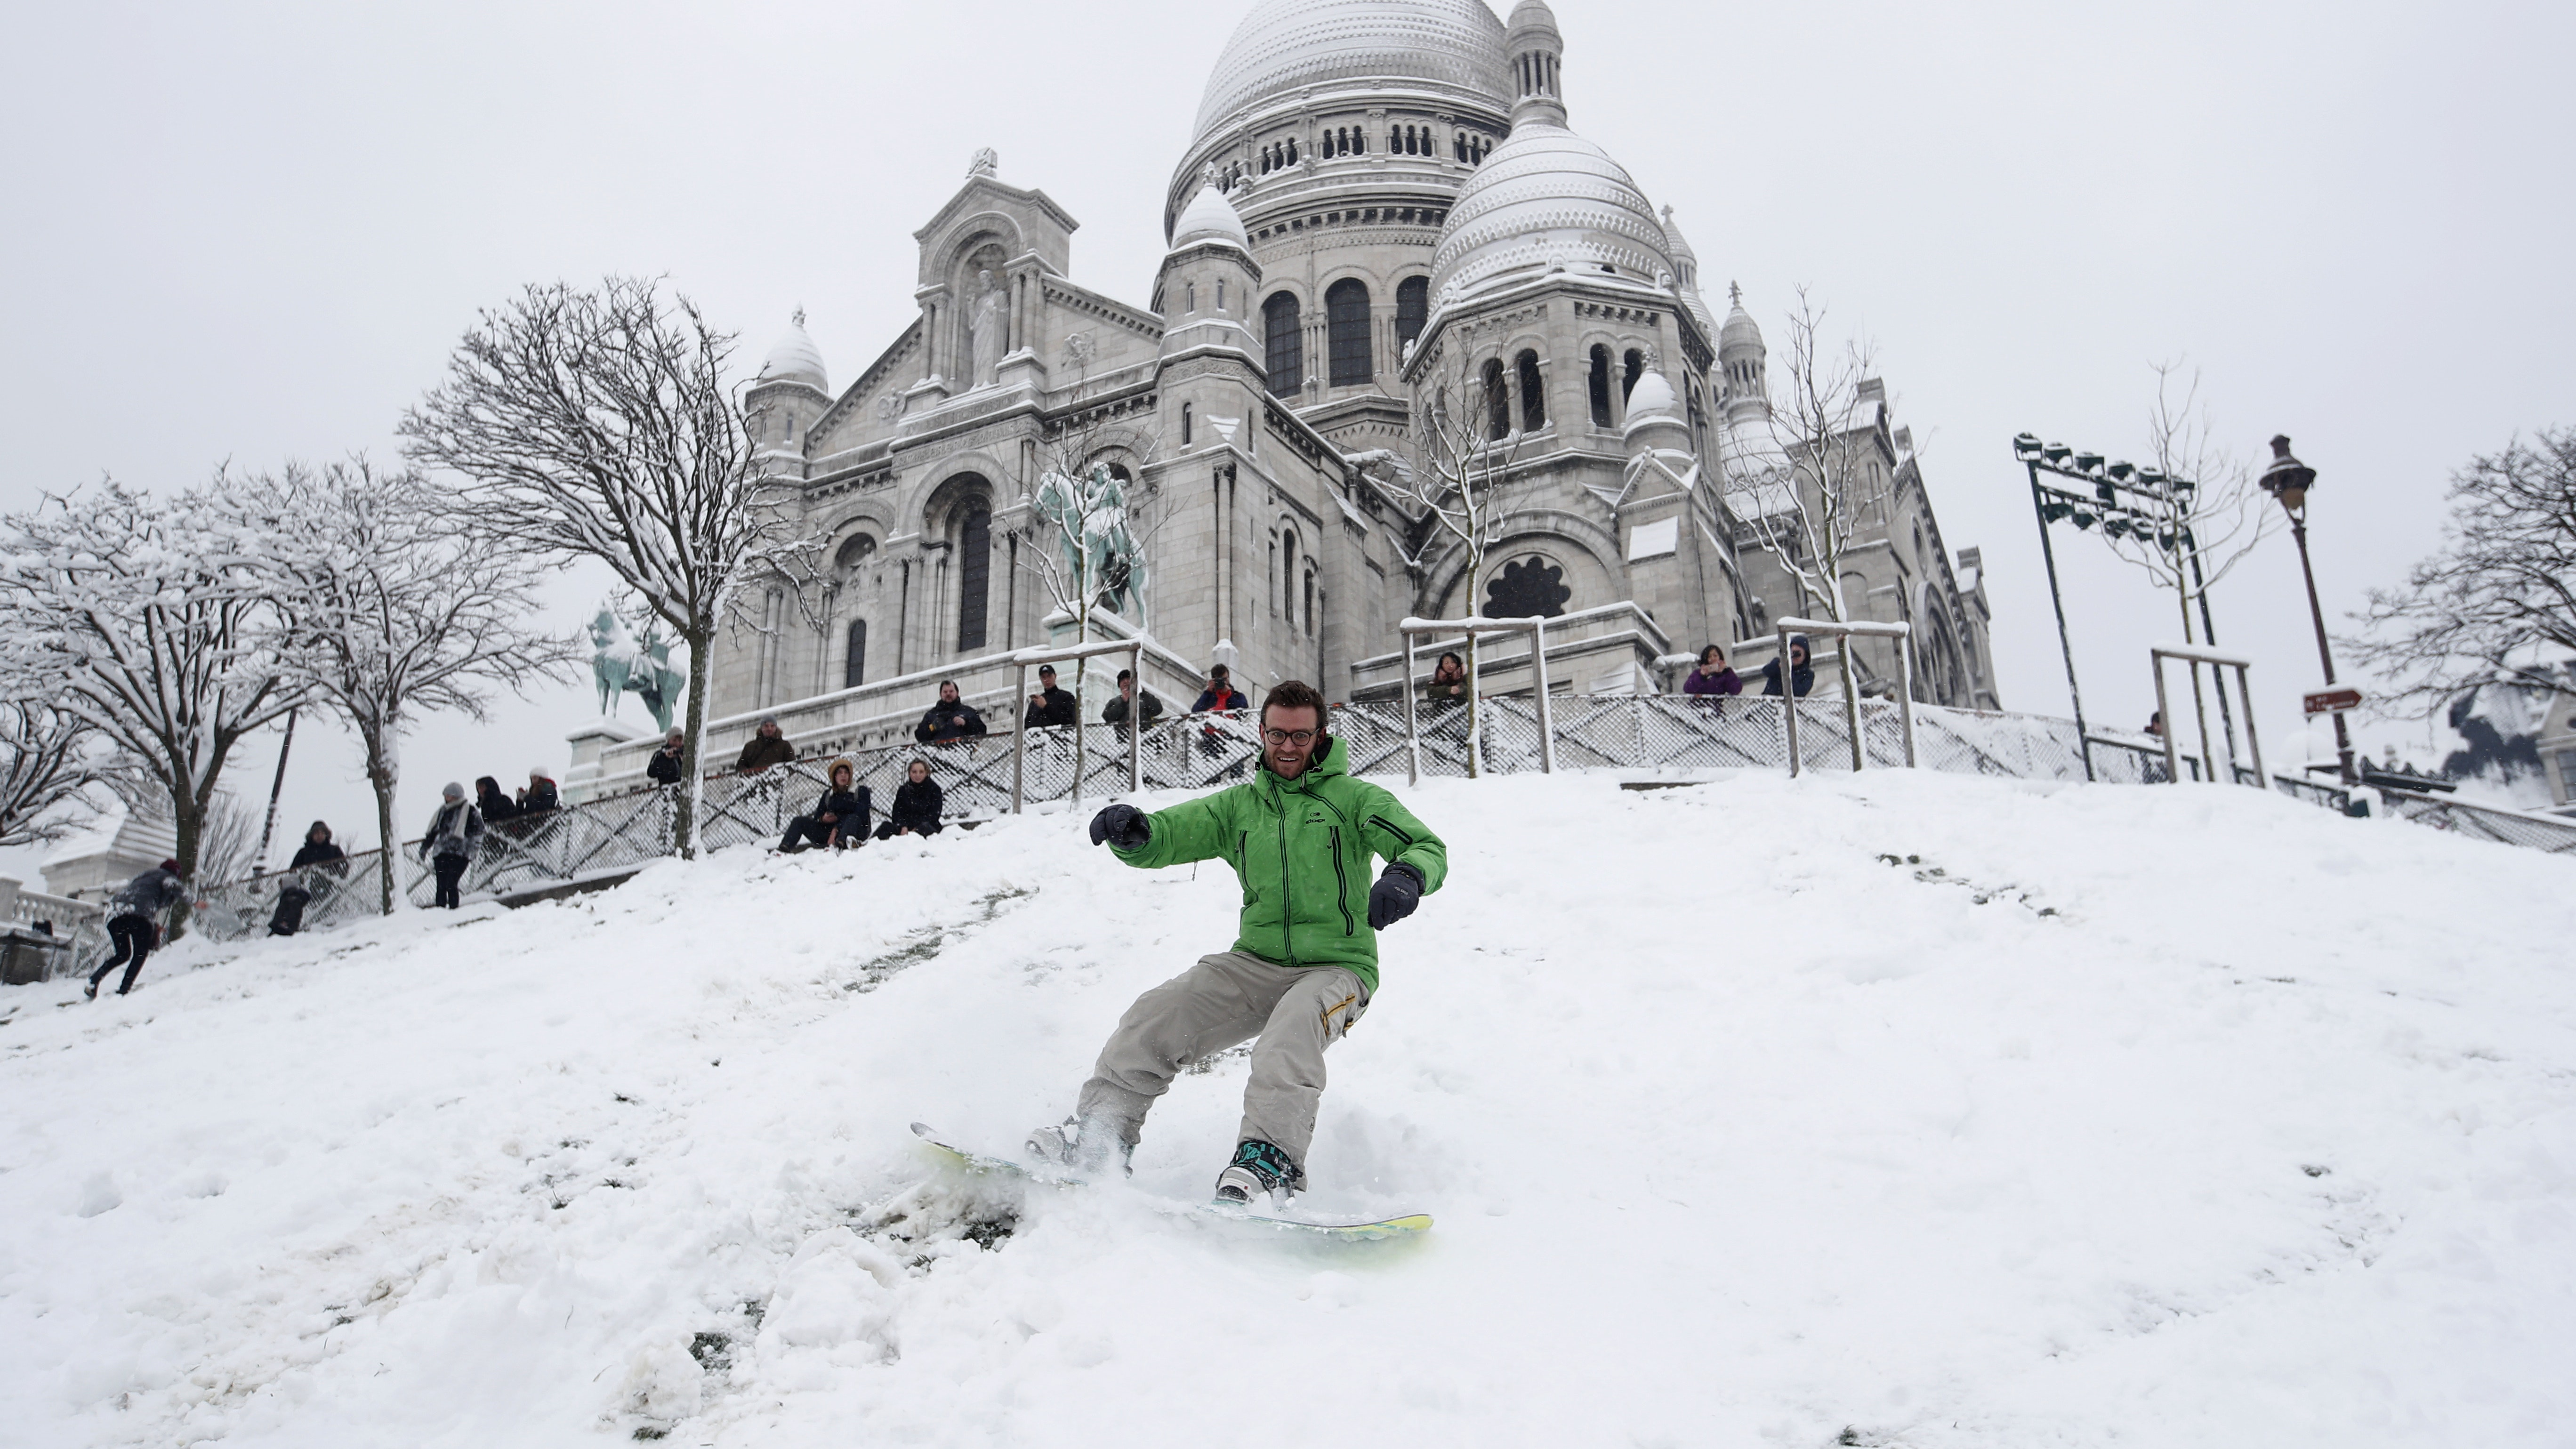 Eiffel Tower closed as heavy snowfall blankets Paris